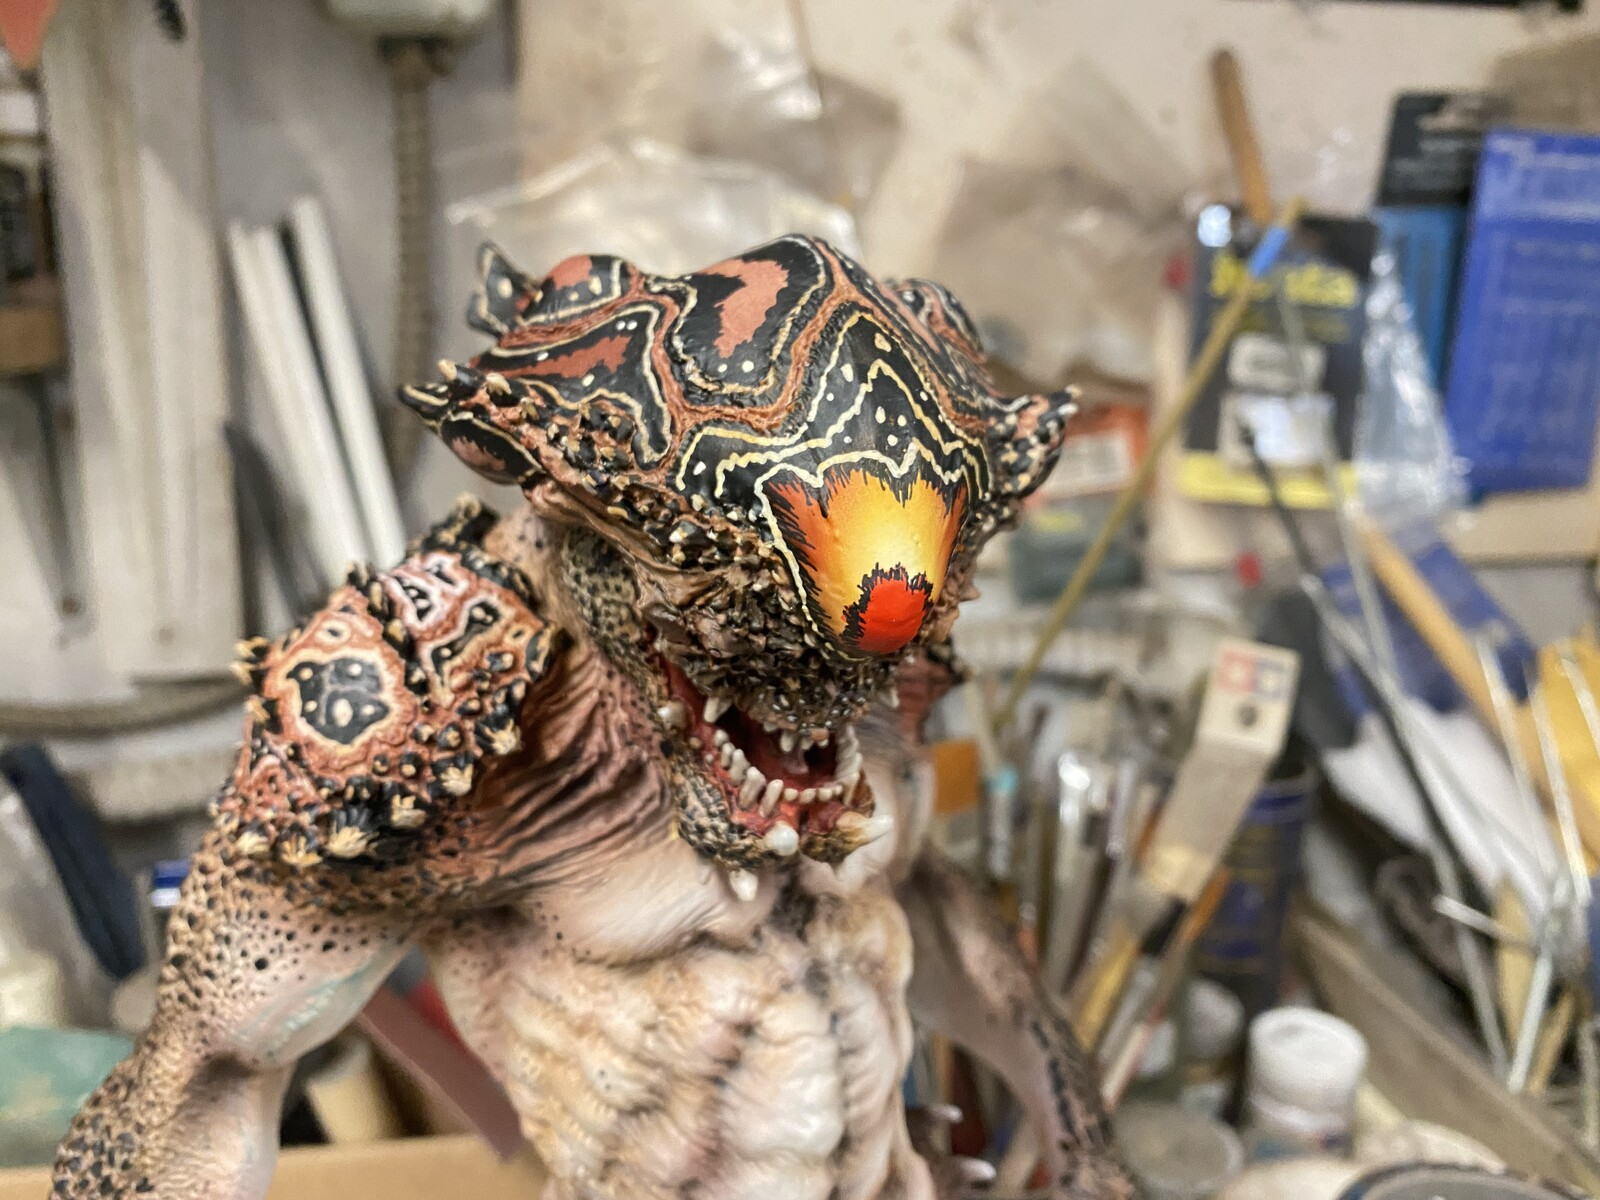 Guyver The Bio-Booster Lisker Art Statue  https://www.solidart.club